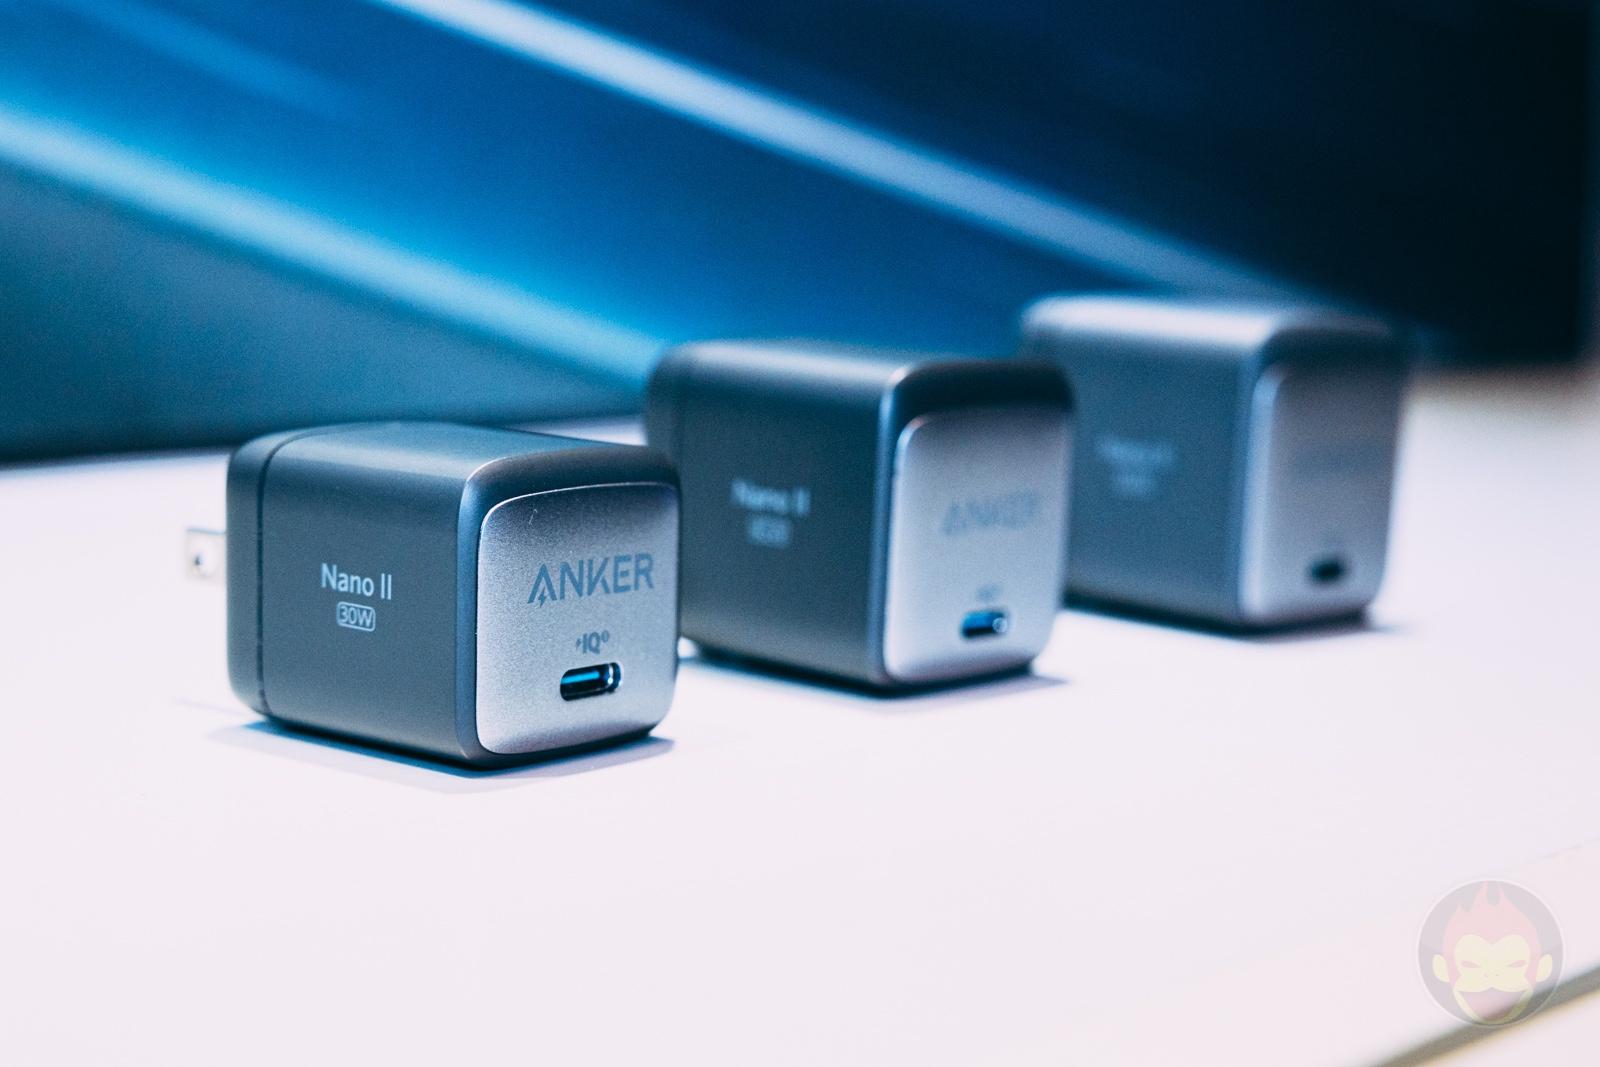 Anker GAN II Nano Series Hands On 09